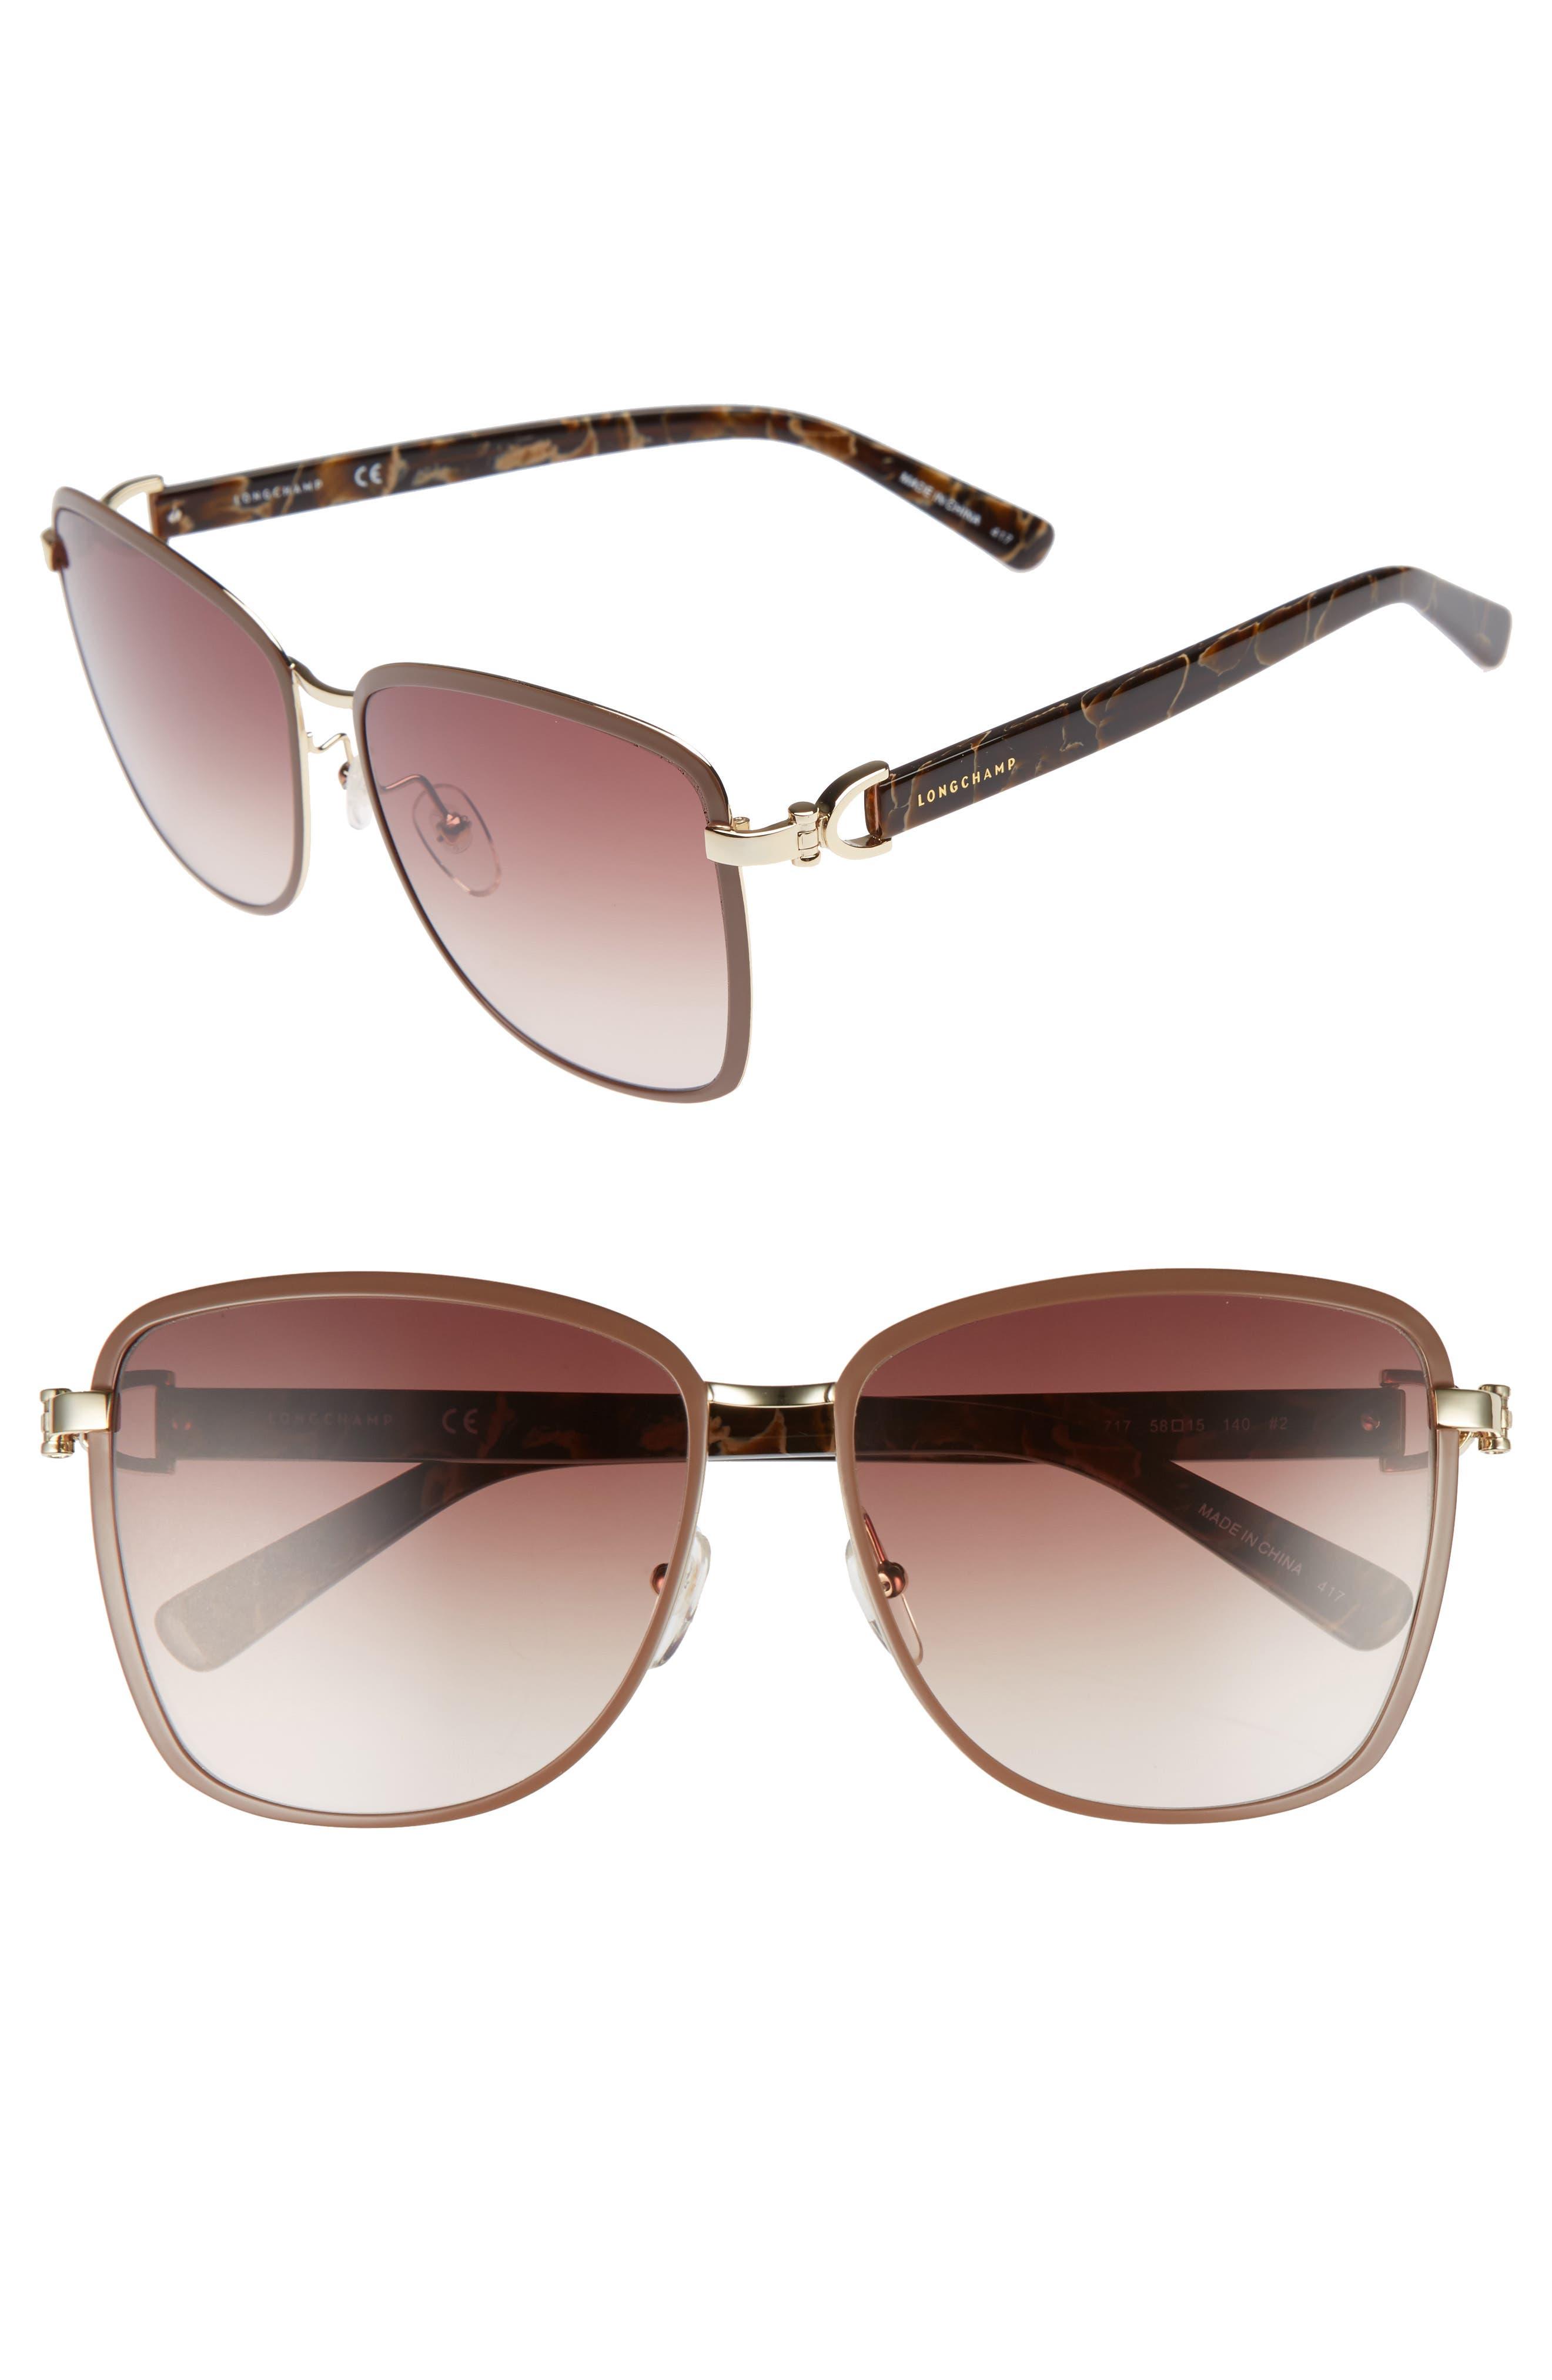 58mm Metal Sunglasses,                             Main thumbnail 1, color,                             Gold/ Brown